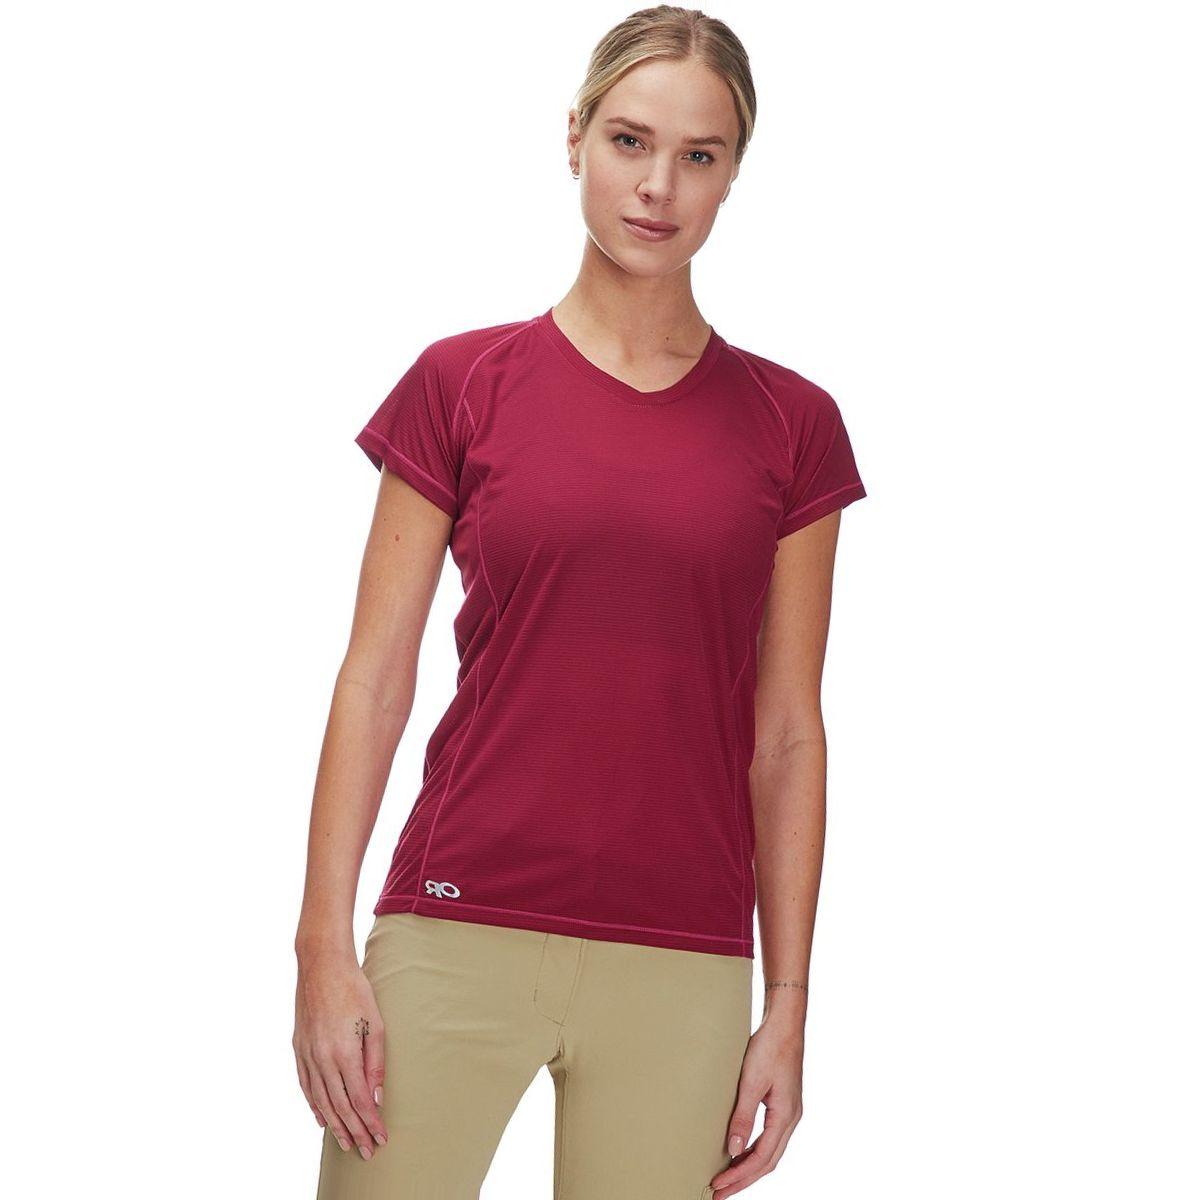 Outdoor Research Echo Short-Sleeve T-Shirt - Women's